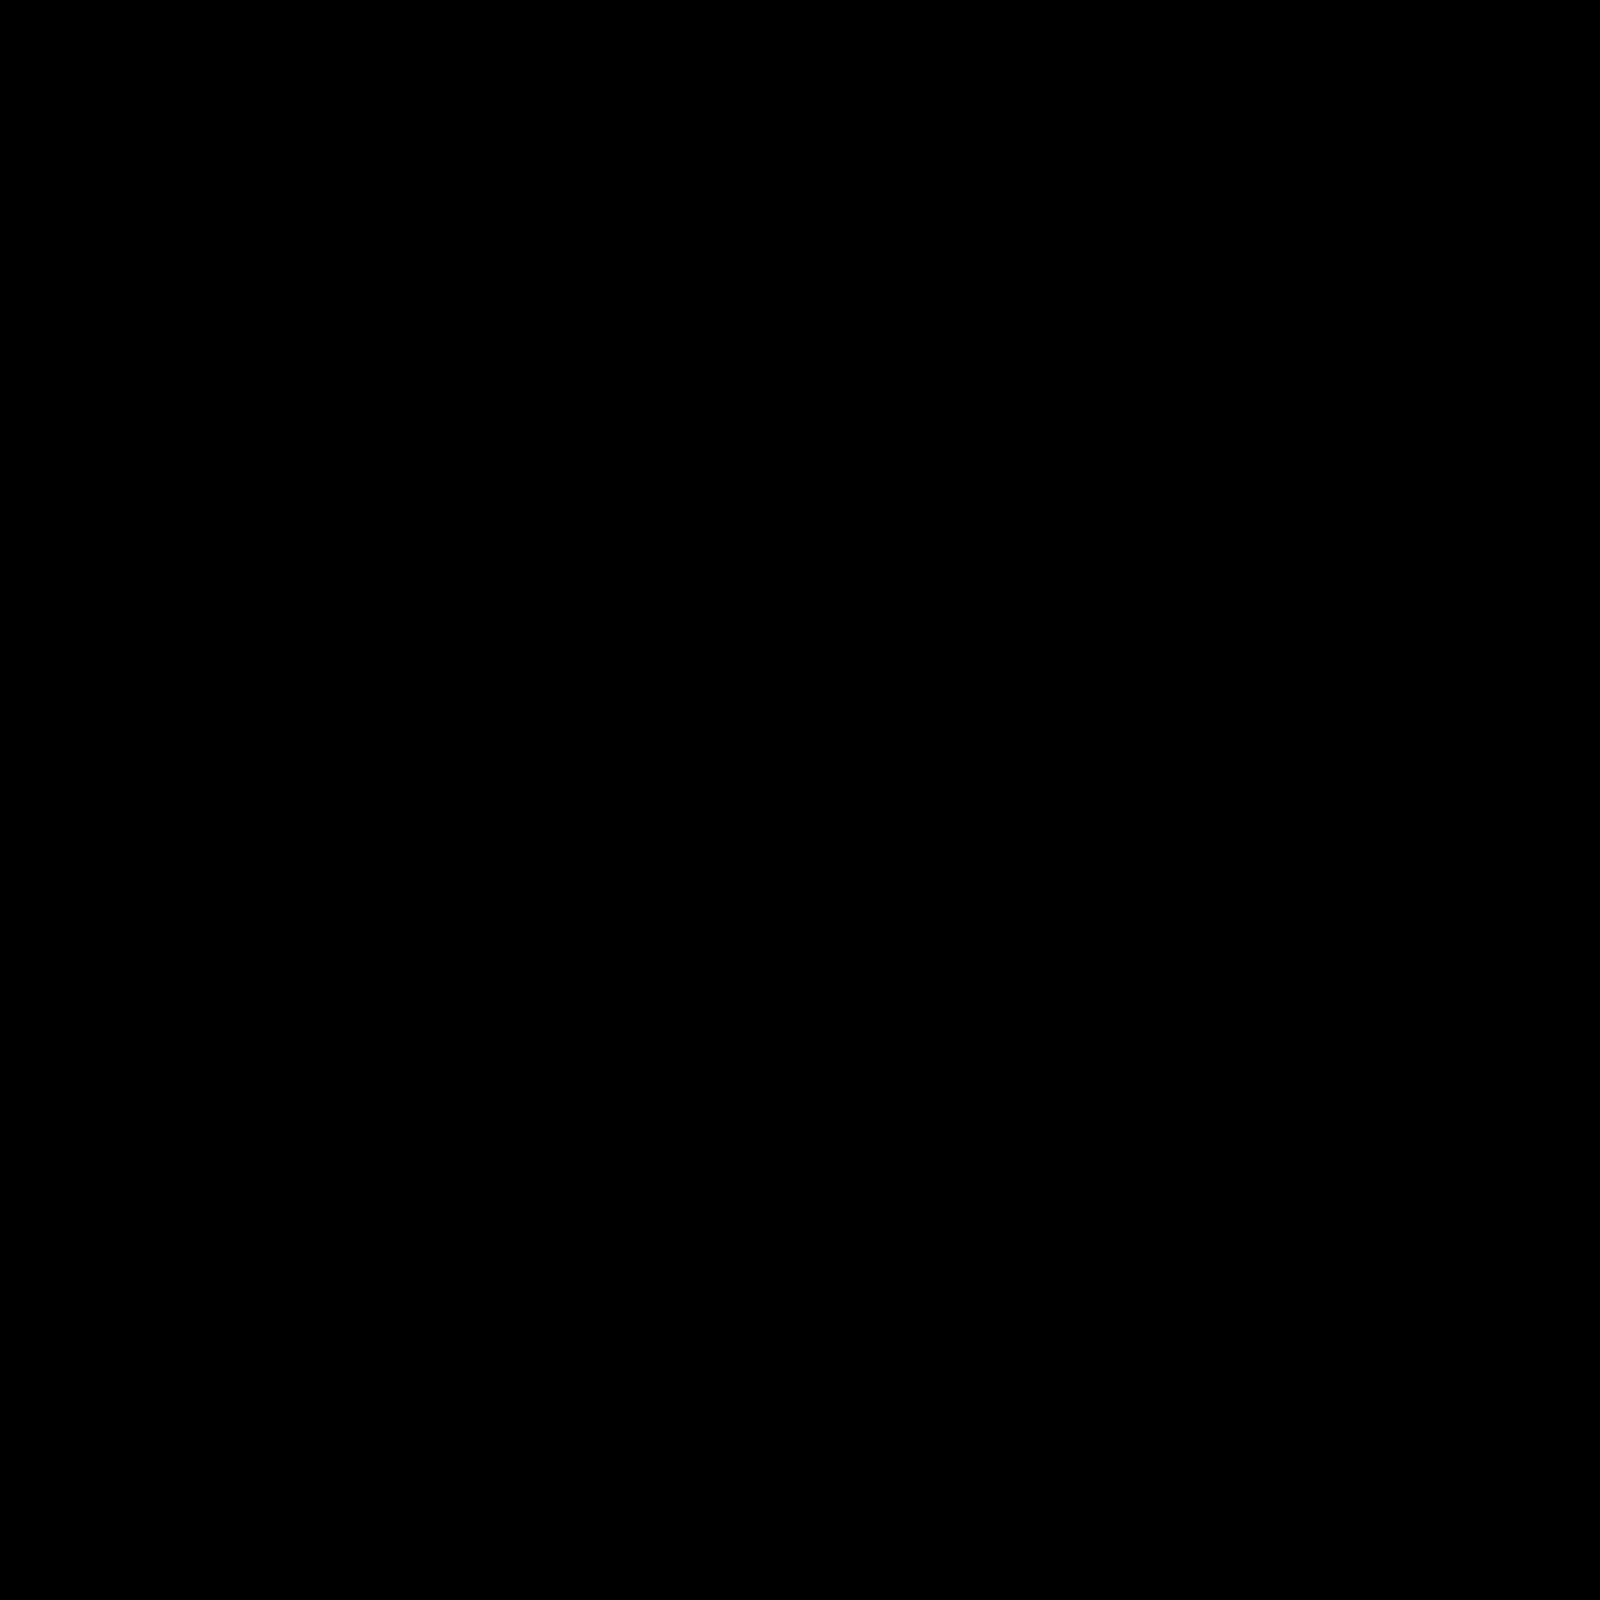 1600x1600 Computer Free Vector Icon